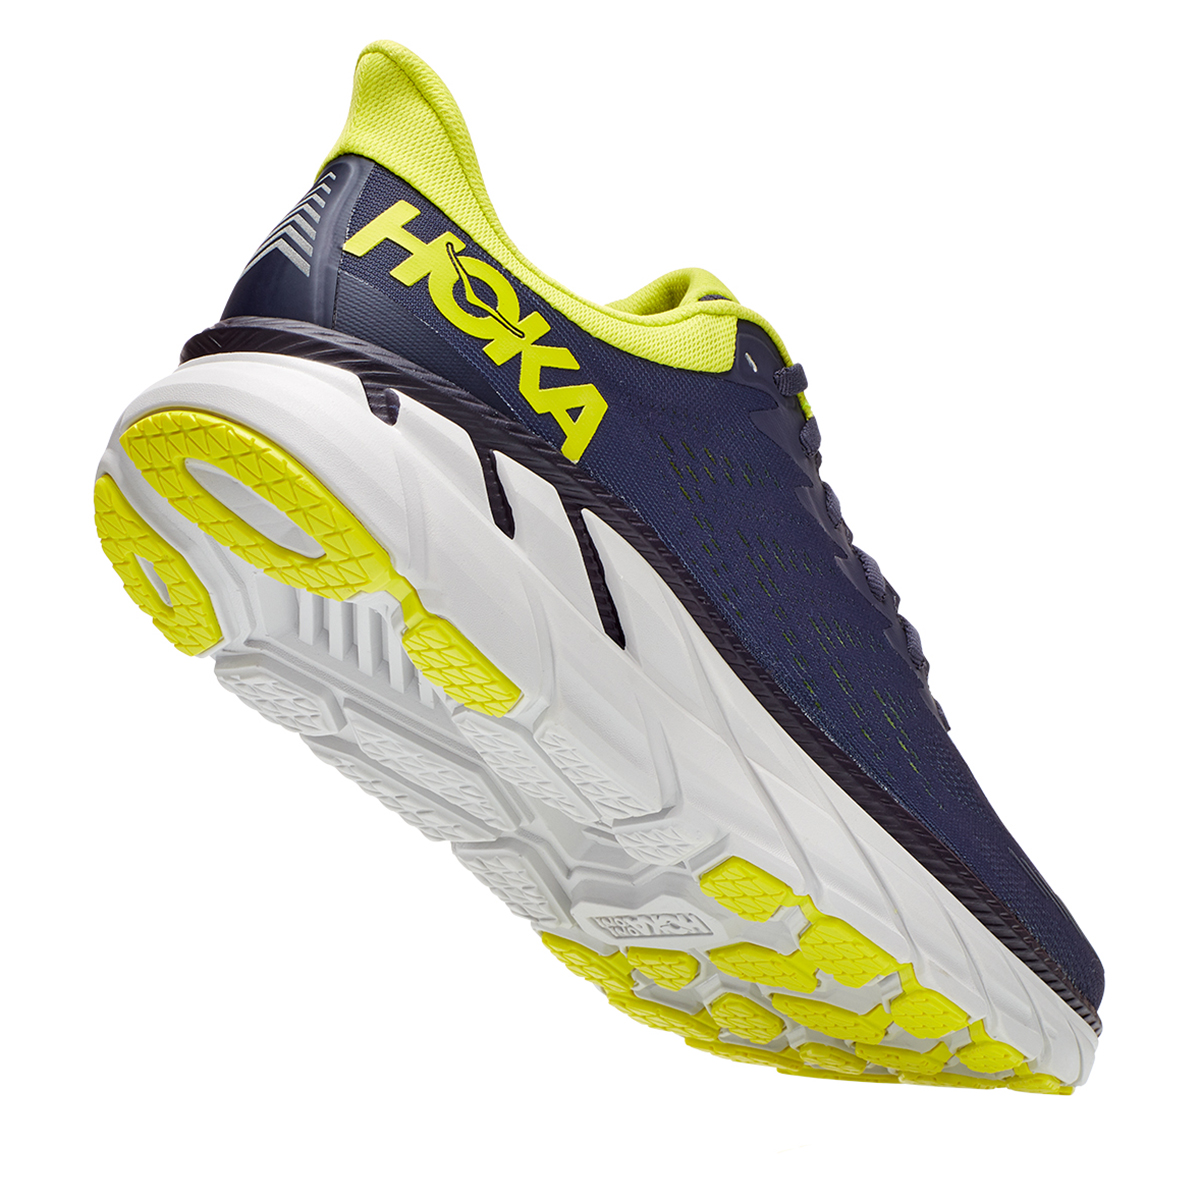 Men's Hoka One One Clifton 7 Running Shoe - Color: Odyssey Grey/Evening Primrose - Size: 7 - Width: Regular, Odyssey Grey/Evening Primrose, large, image 5